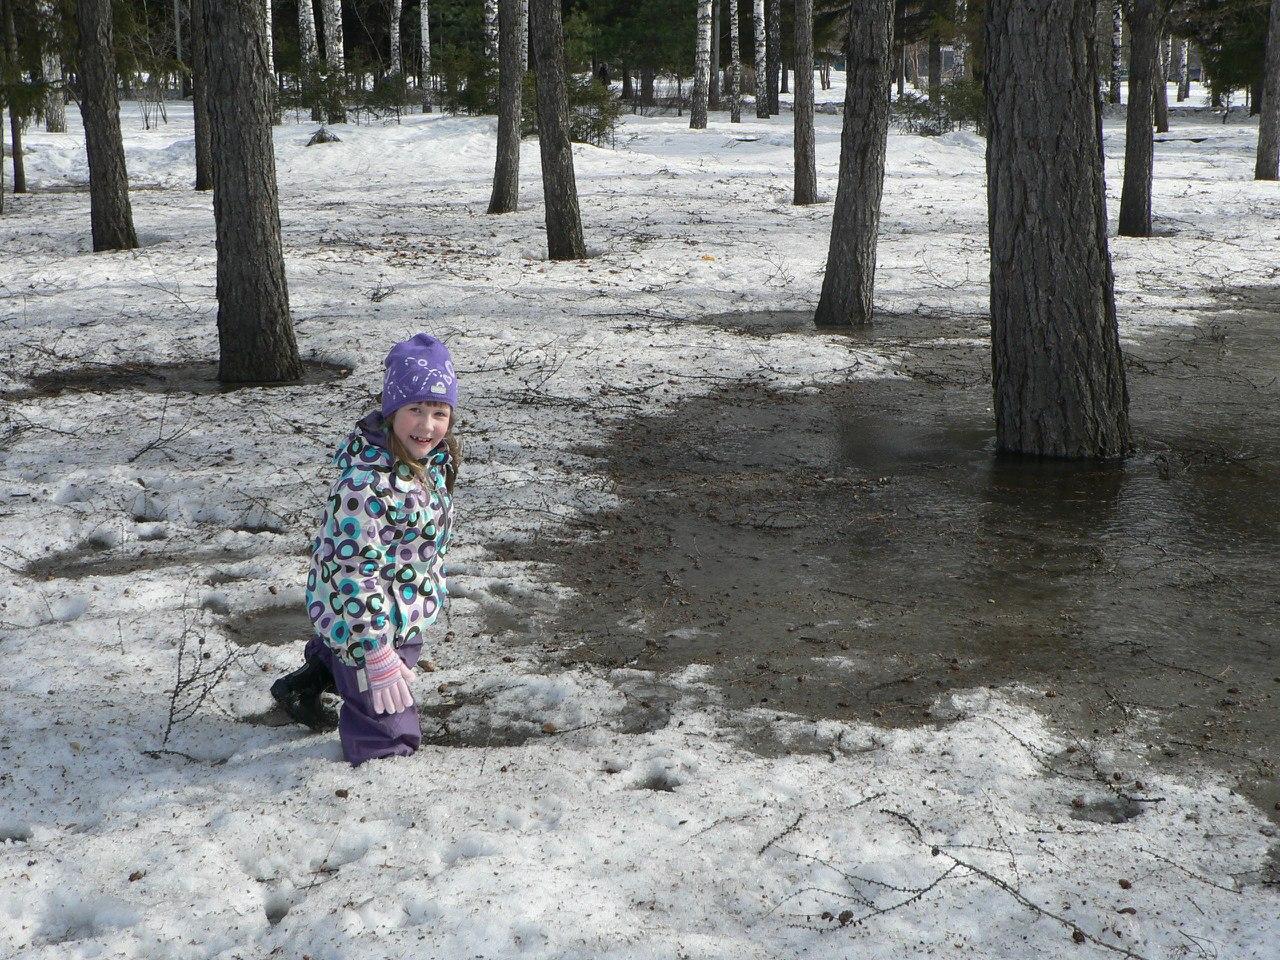 зимняя детская одежда ticket to heaven